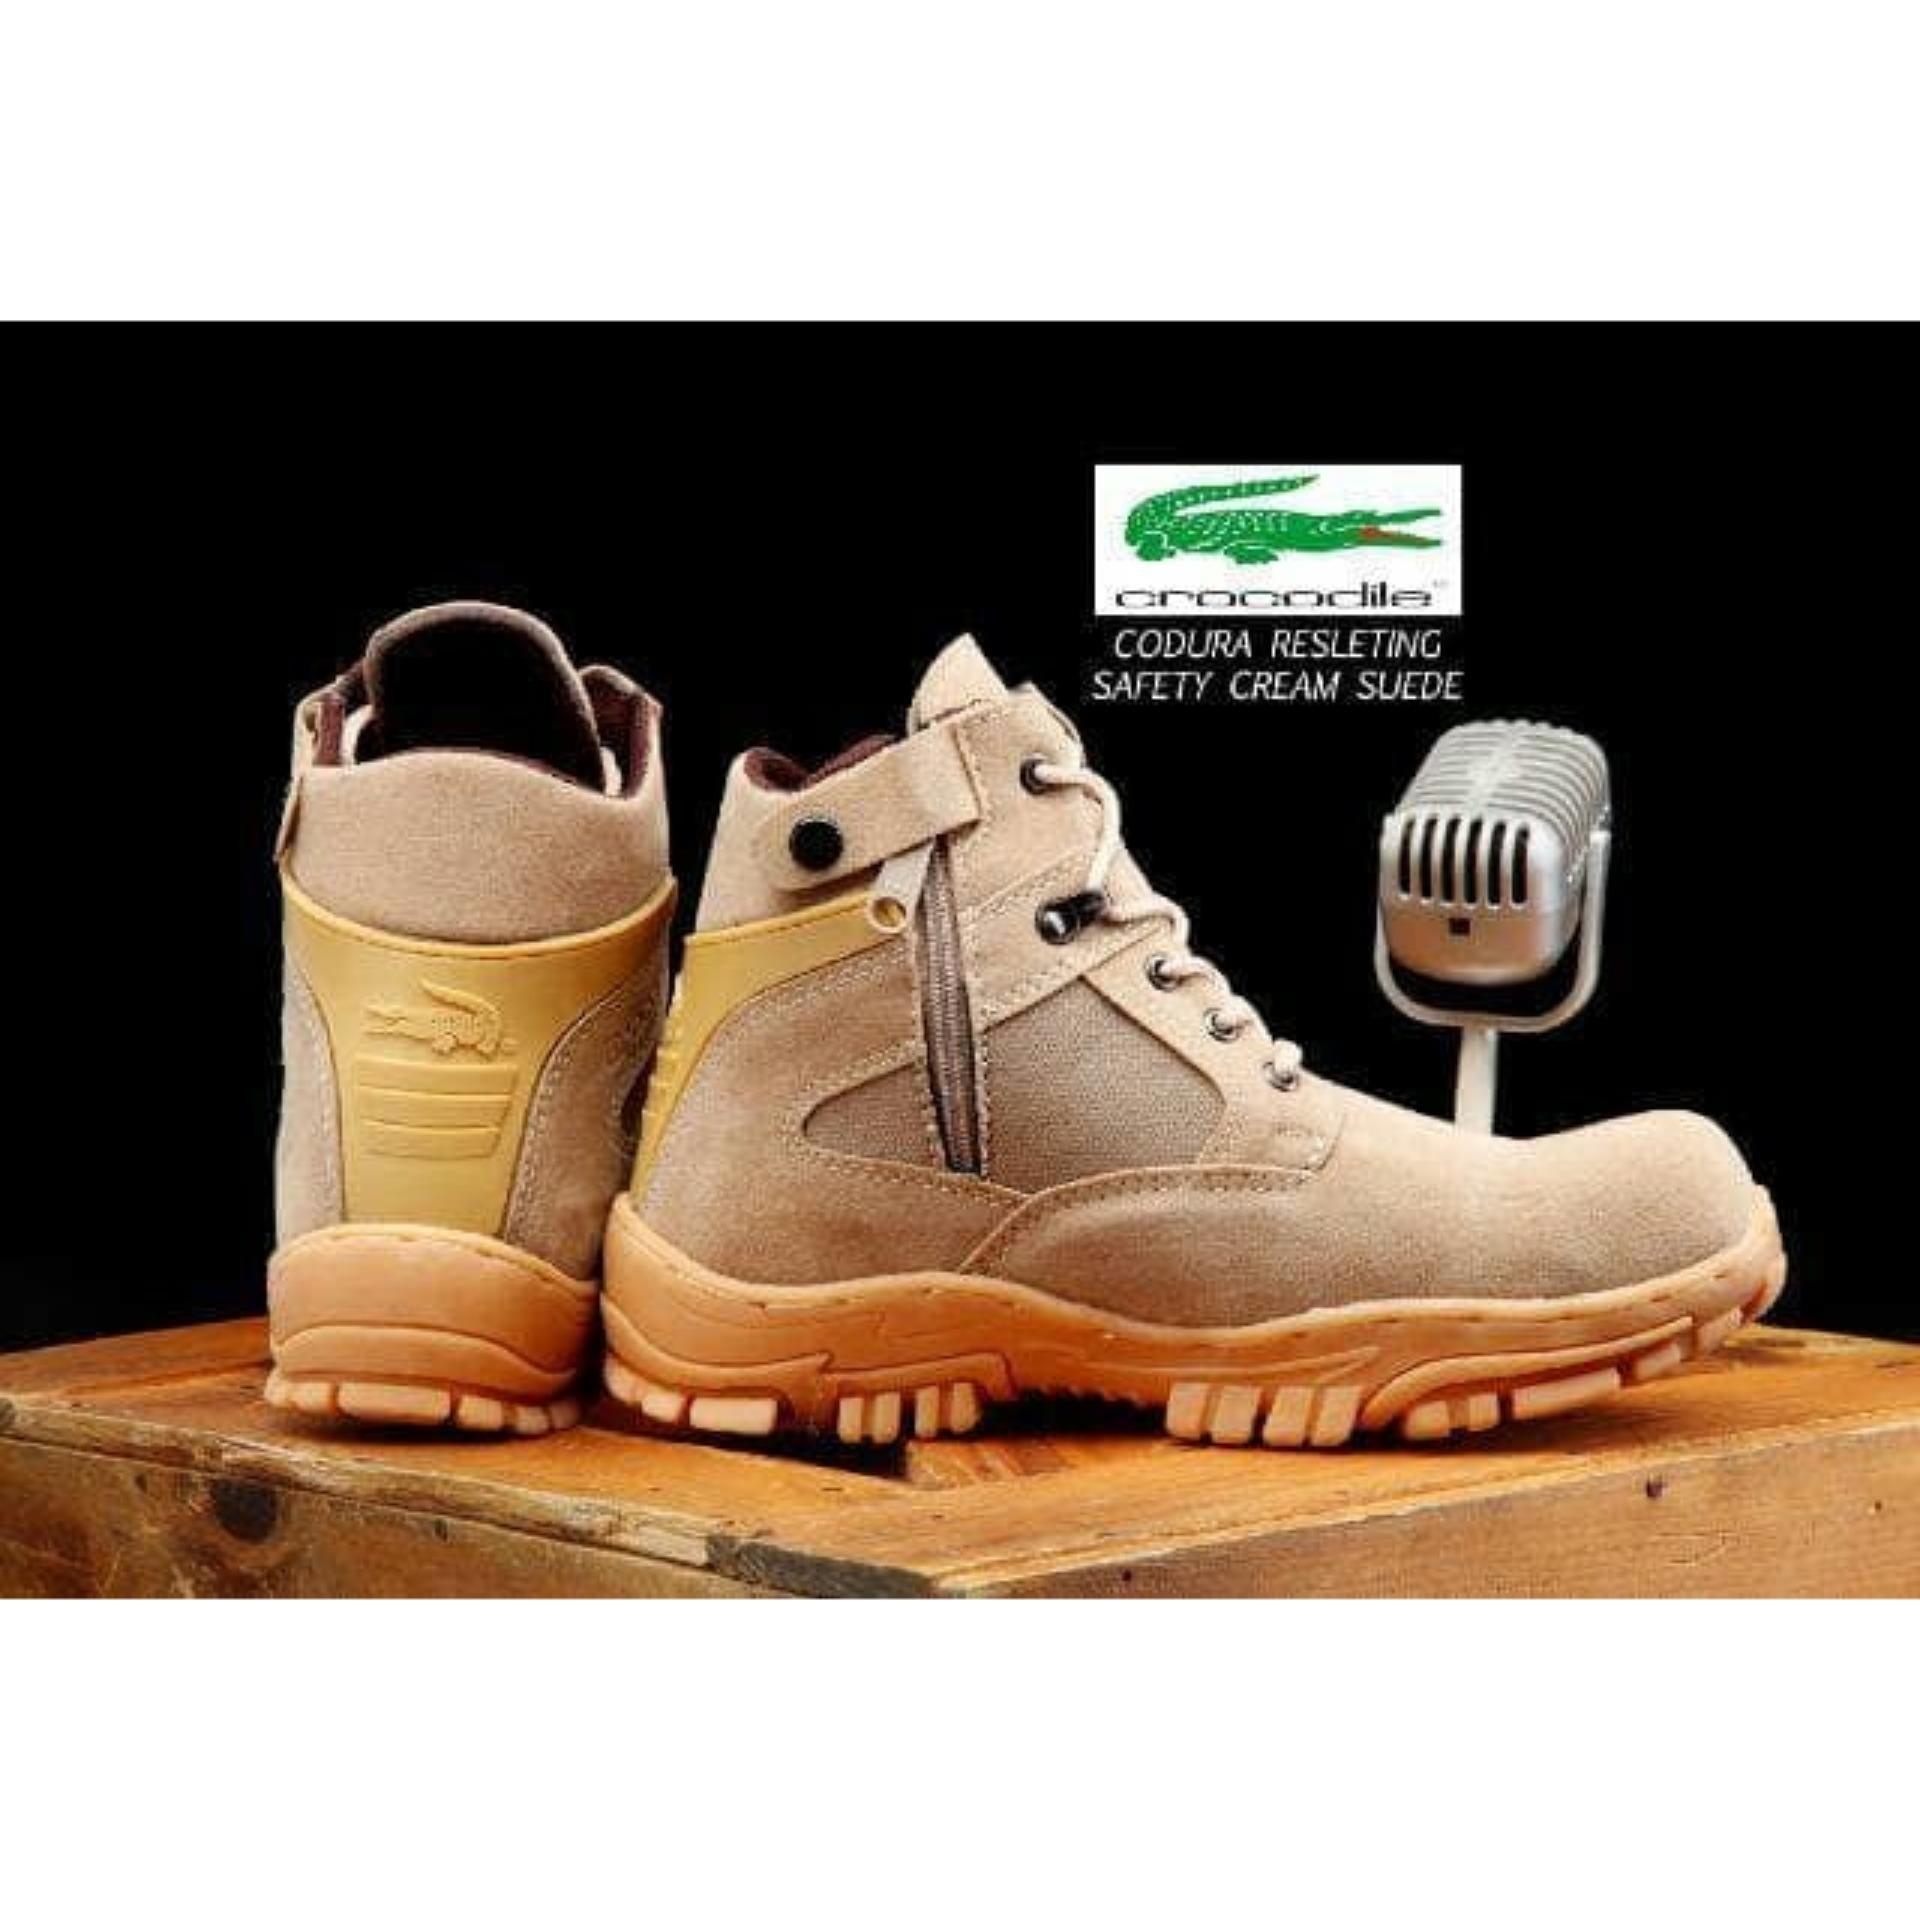 Sepatu Pria Boots Safety Crocodile Cordura Resleting Ujung Besi Nike California Tracking Proyek Tactical